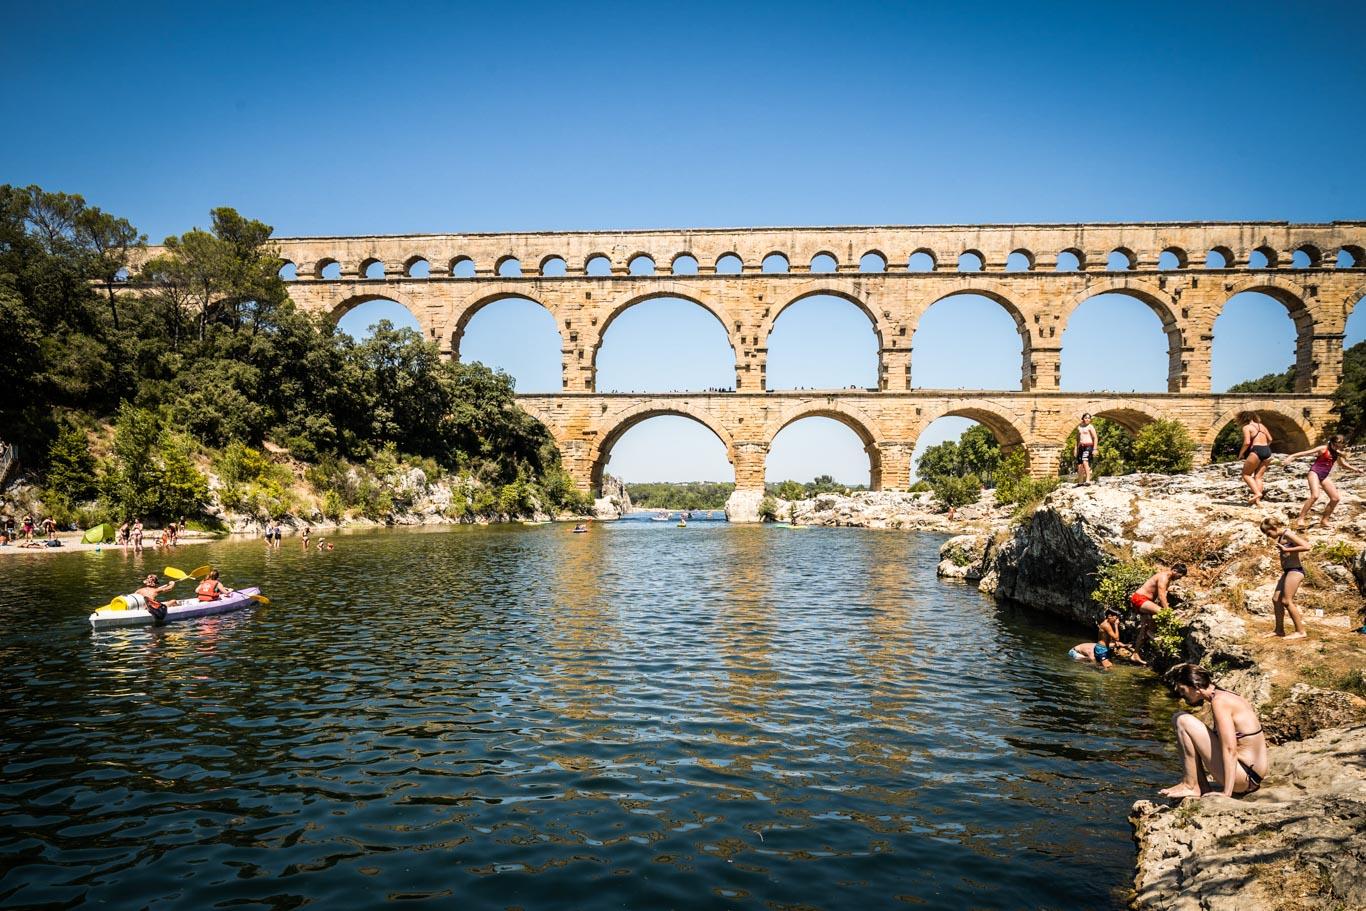 Provenza Pont du Gard